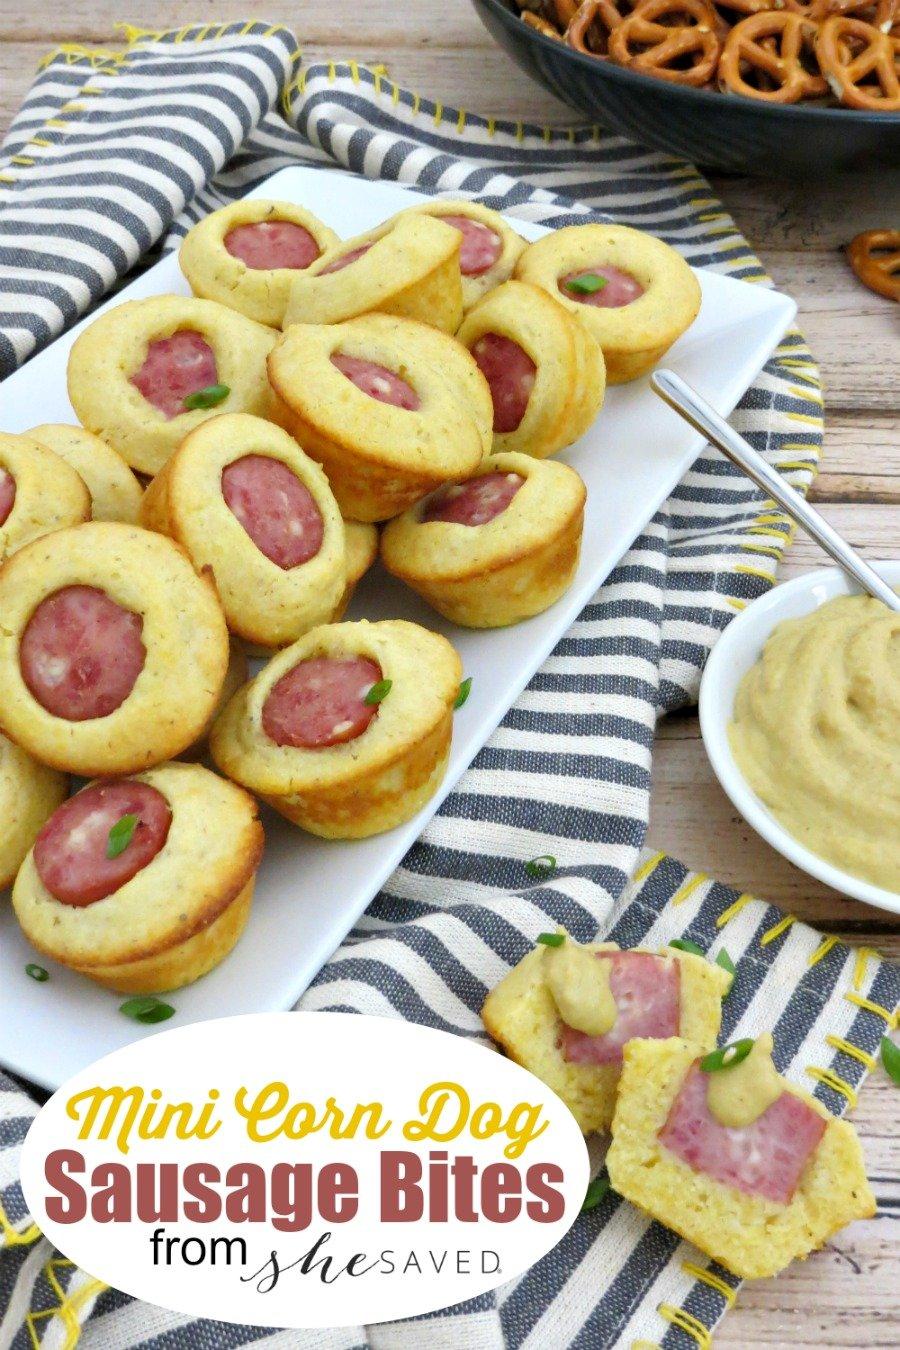 Mini Essentials: Awesome Sausage Bites | Just A Pinch Recipes |Mini Sausage Bites